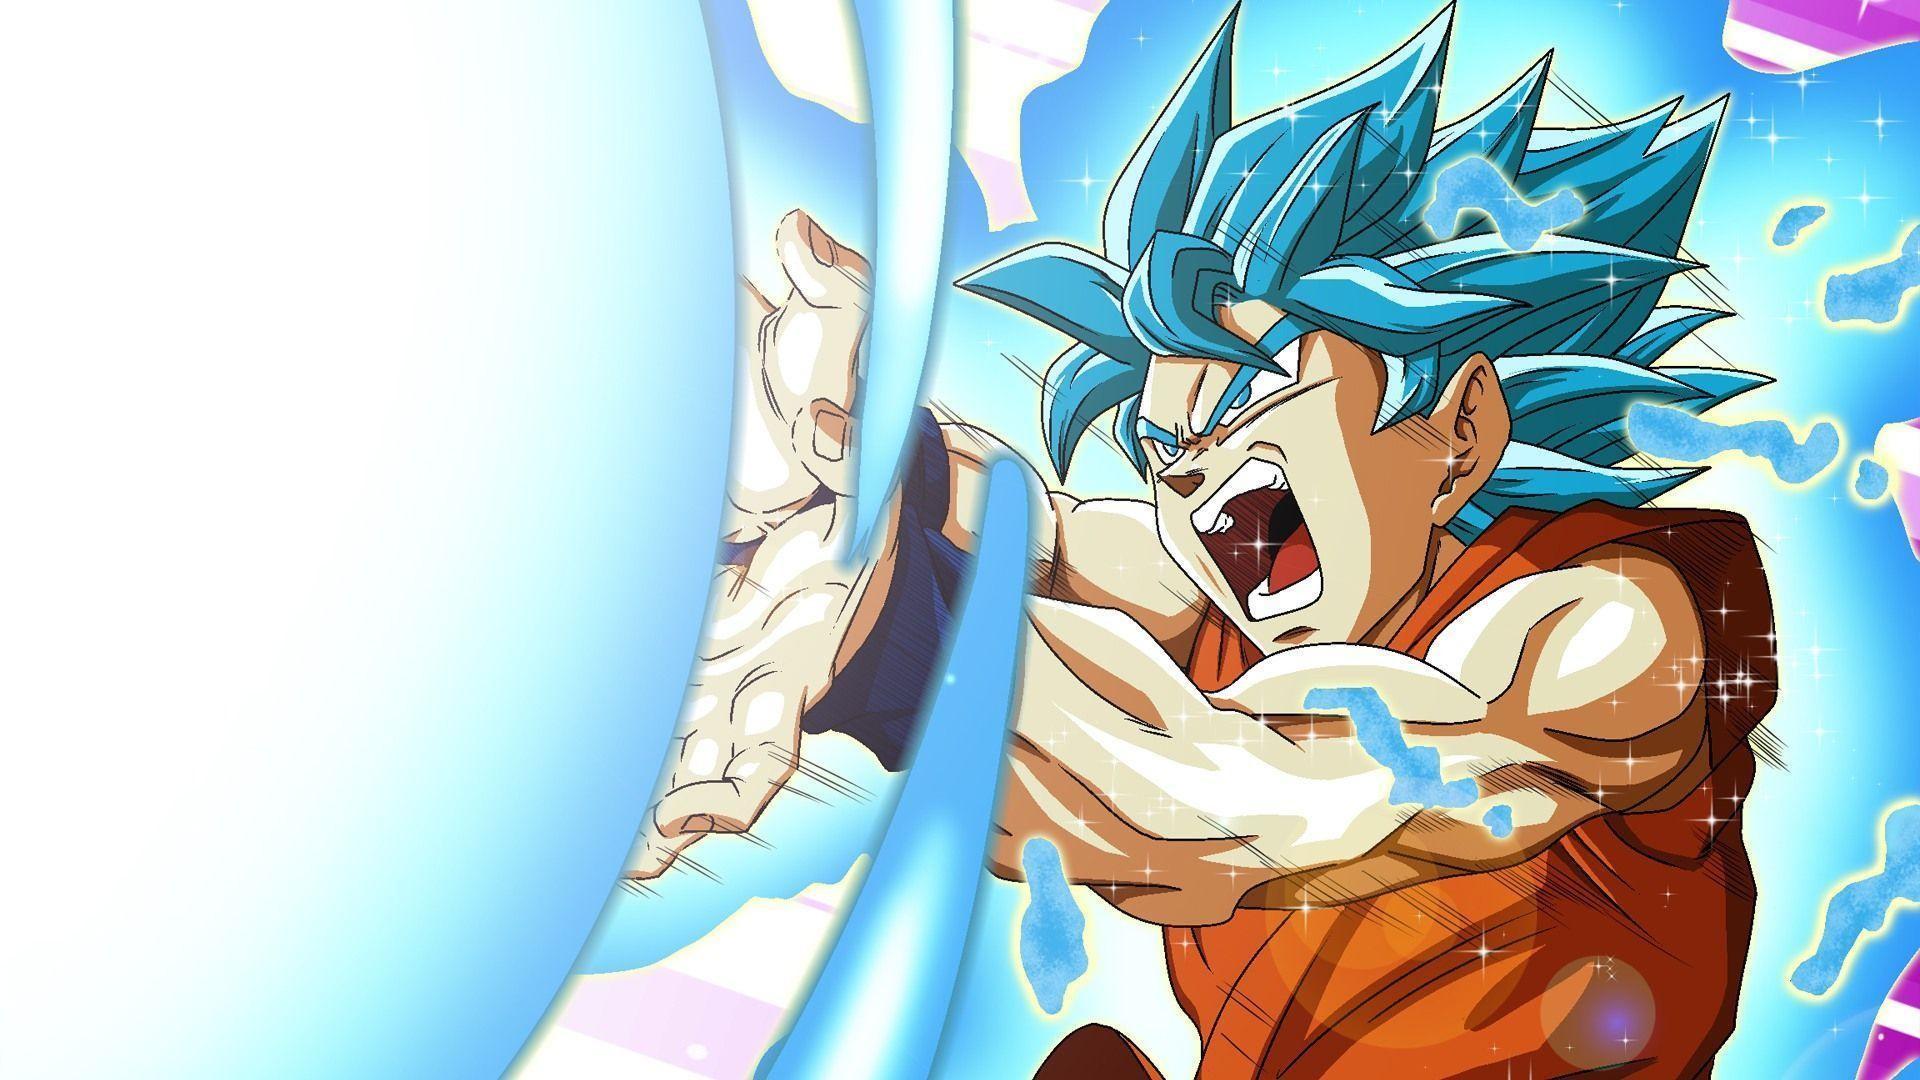 Goku Super Saiyan Blue Kamehameha Wa… Wallpaper #9577